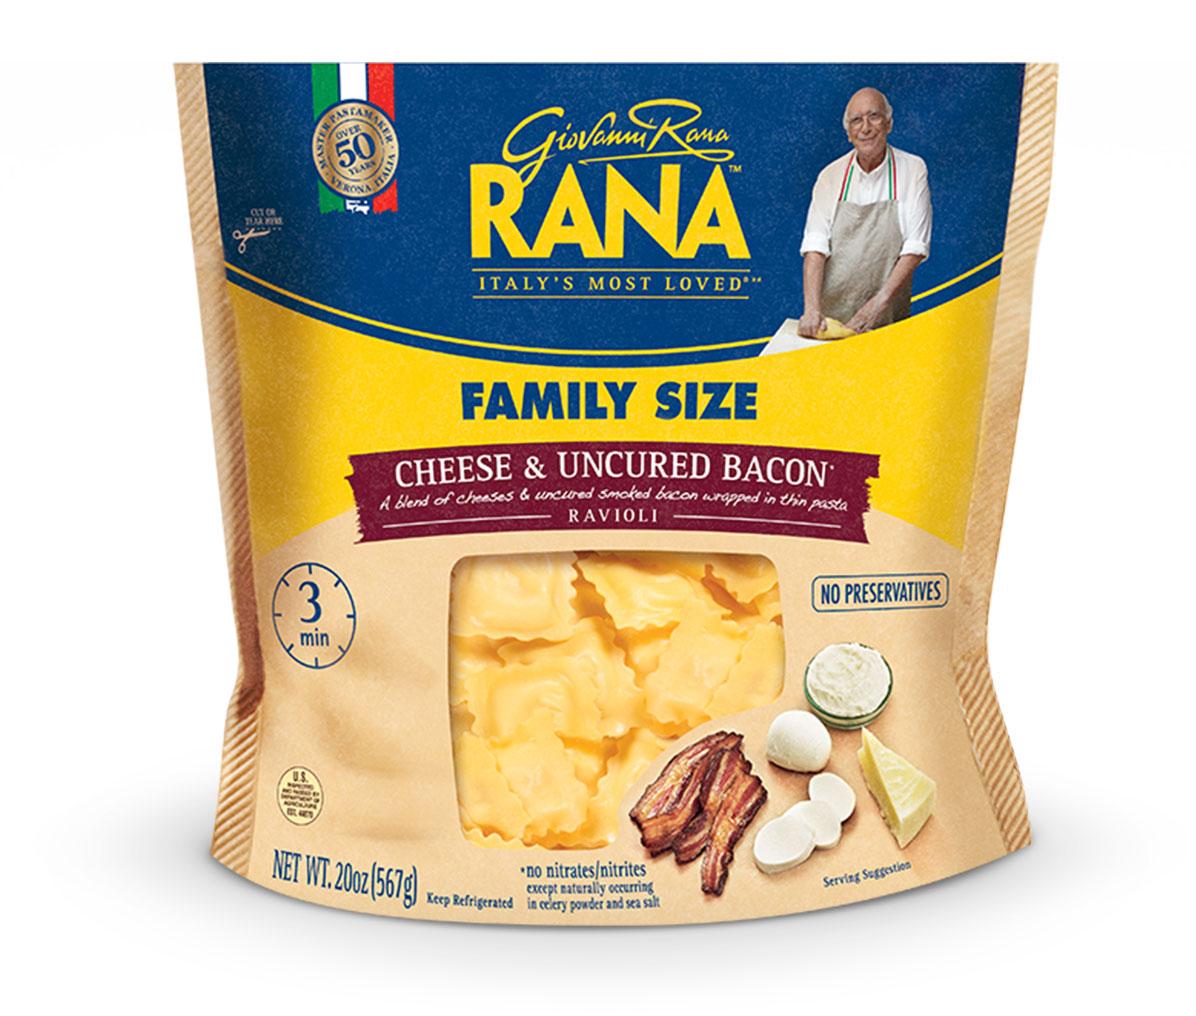 Cheese & Uncured Bacon Ravioli